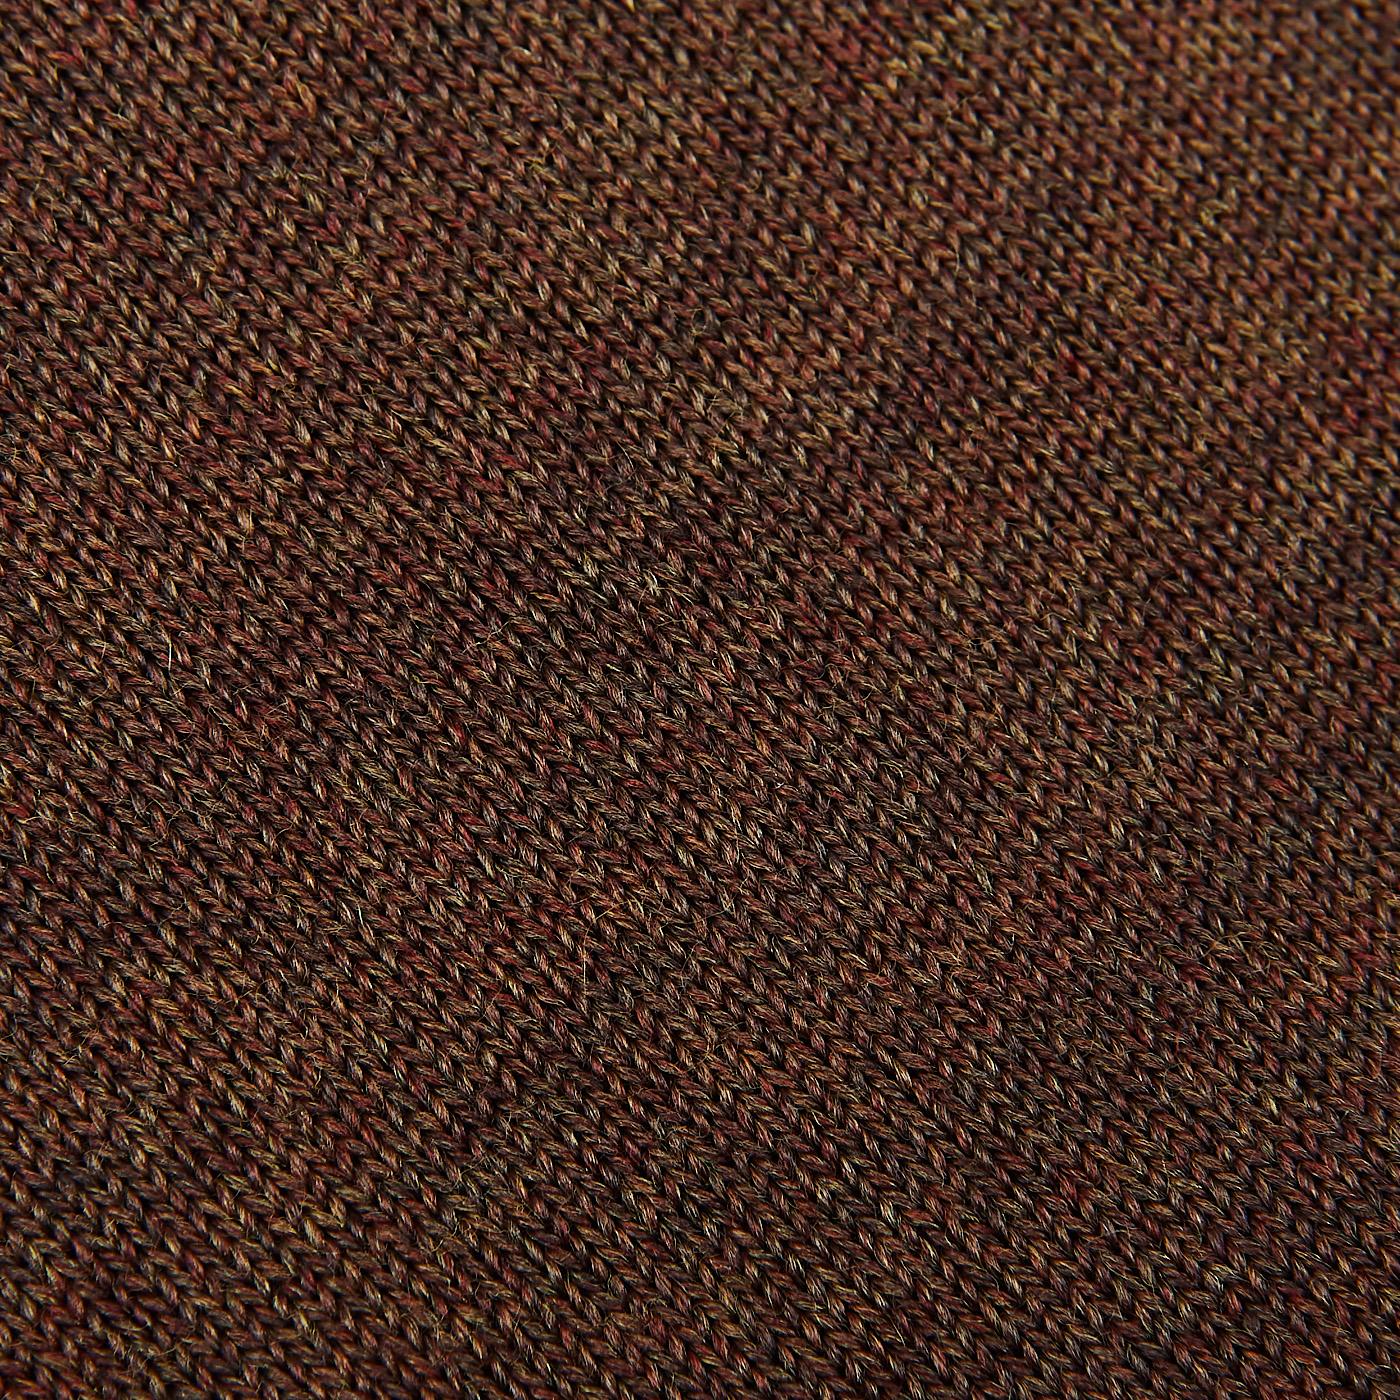 Stenströms Brown Zegna Baruffa Merino Wool Polo Shirt Fabric